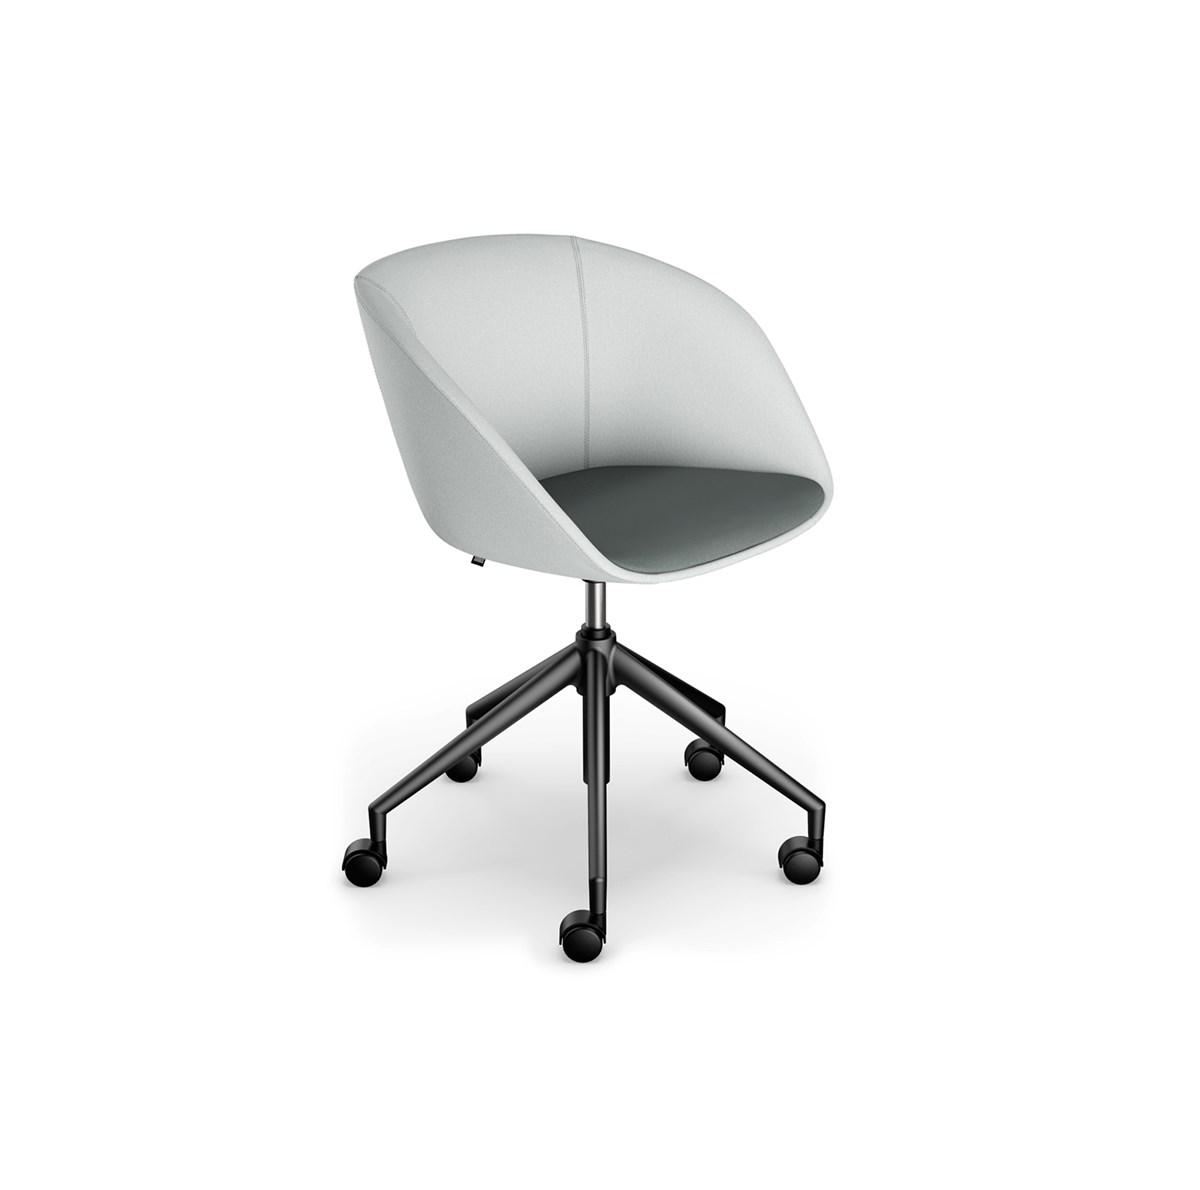 Sedus-On-Spot-Cosy-Chair-Matisse-2